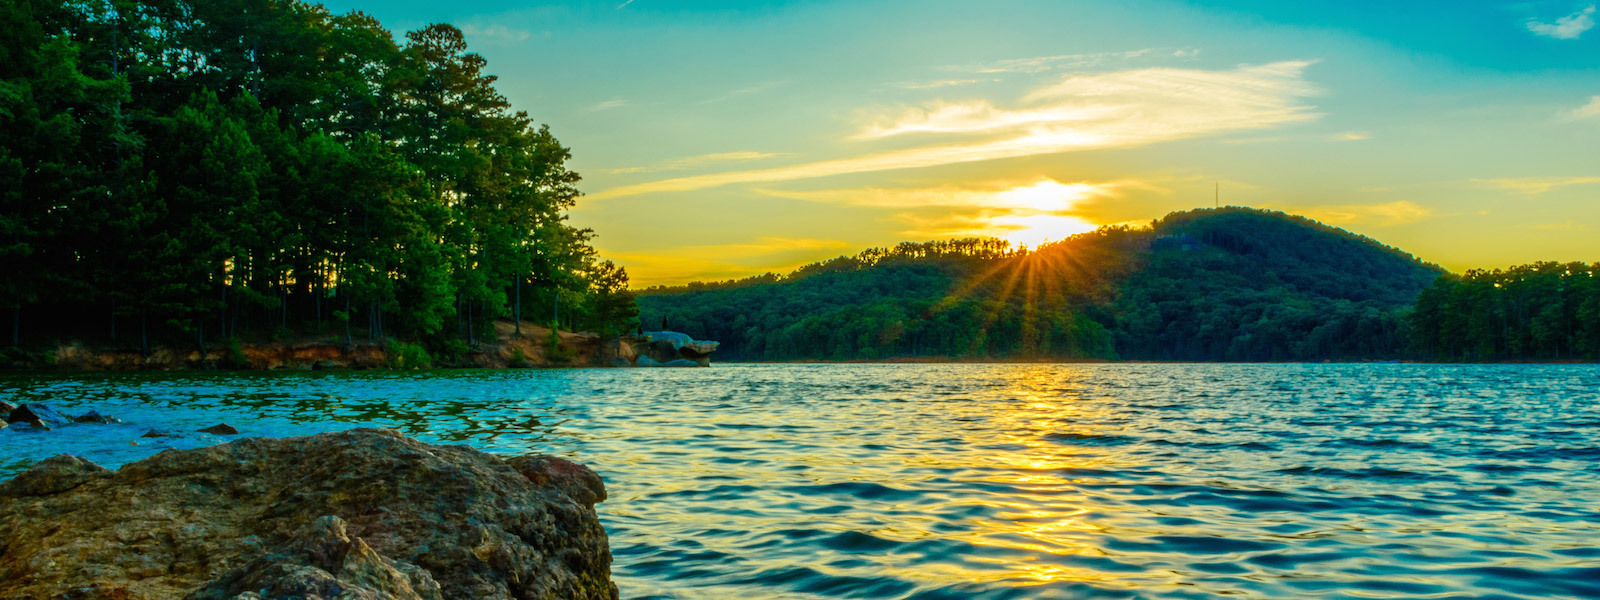 Lake Photo 4